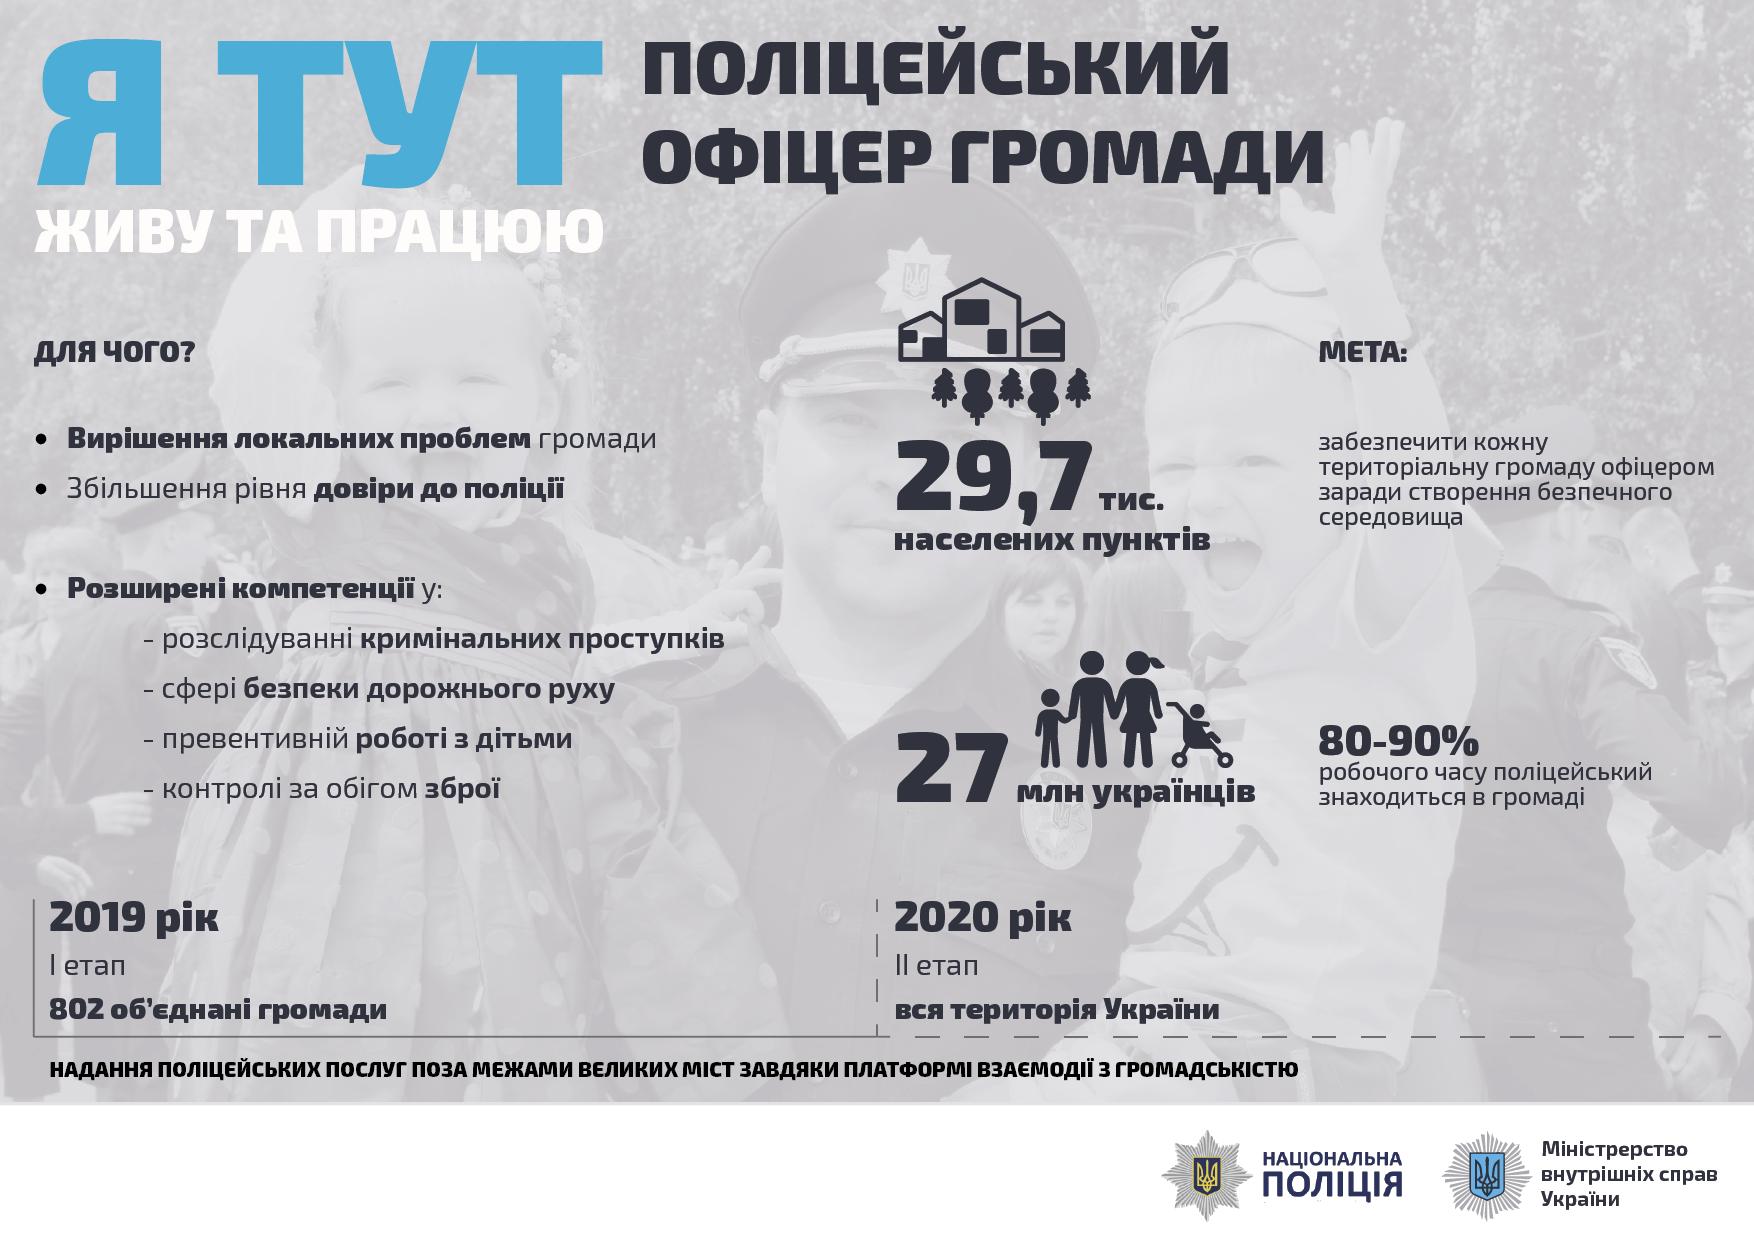 Фото: mvs.gov.ua/